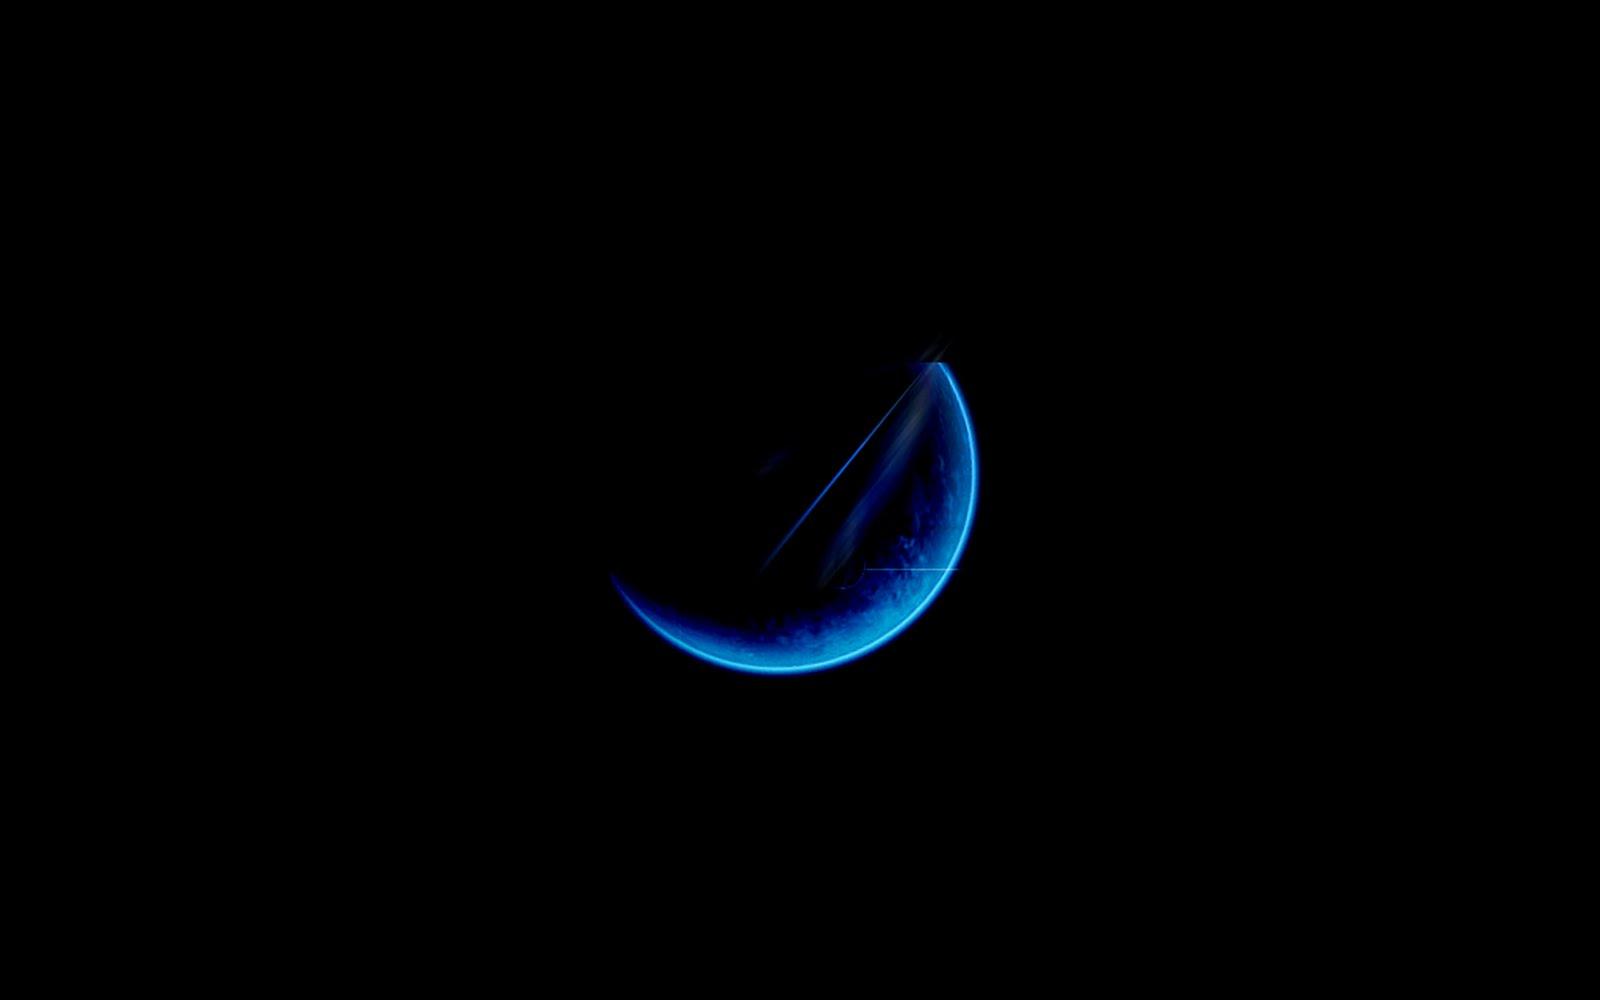 download 1920x1080 blue black - photo #46